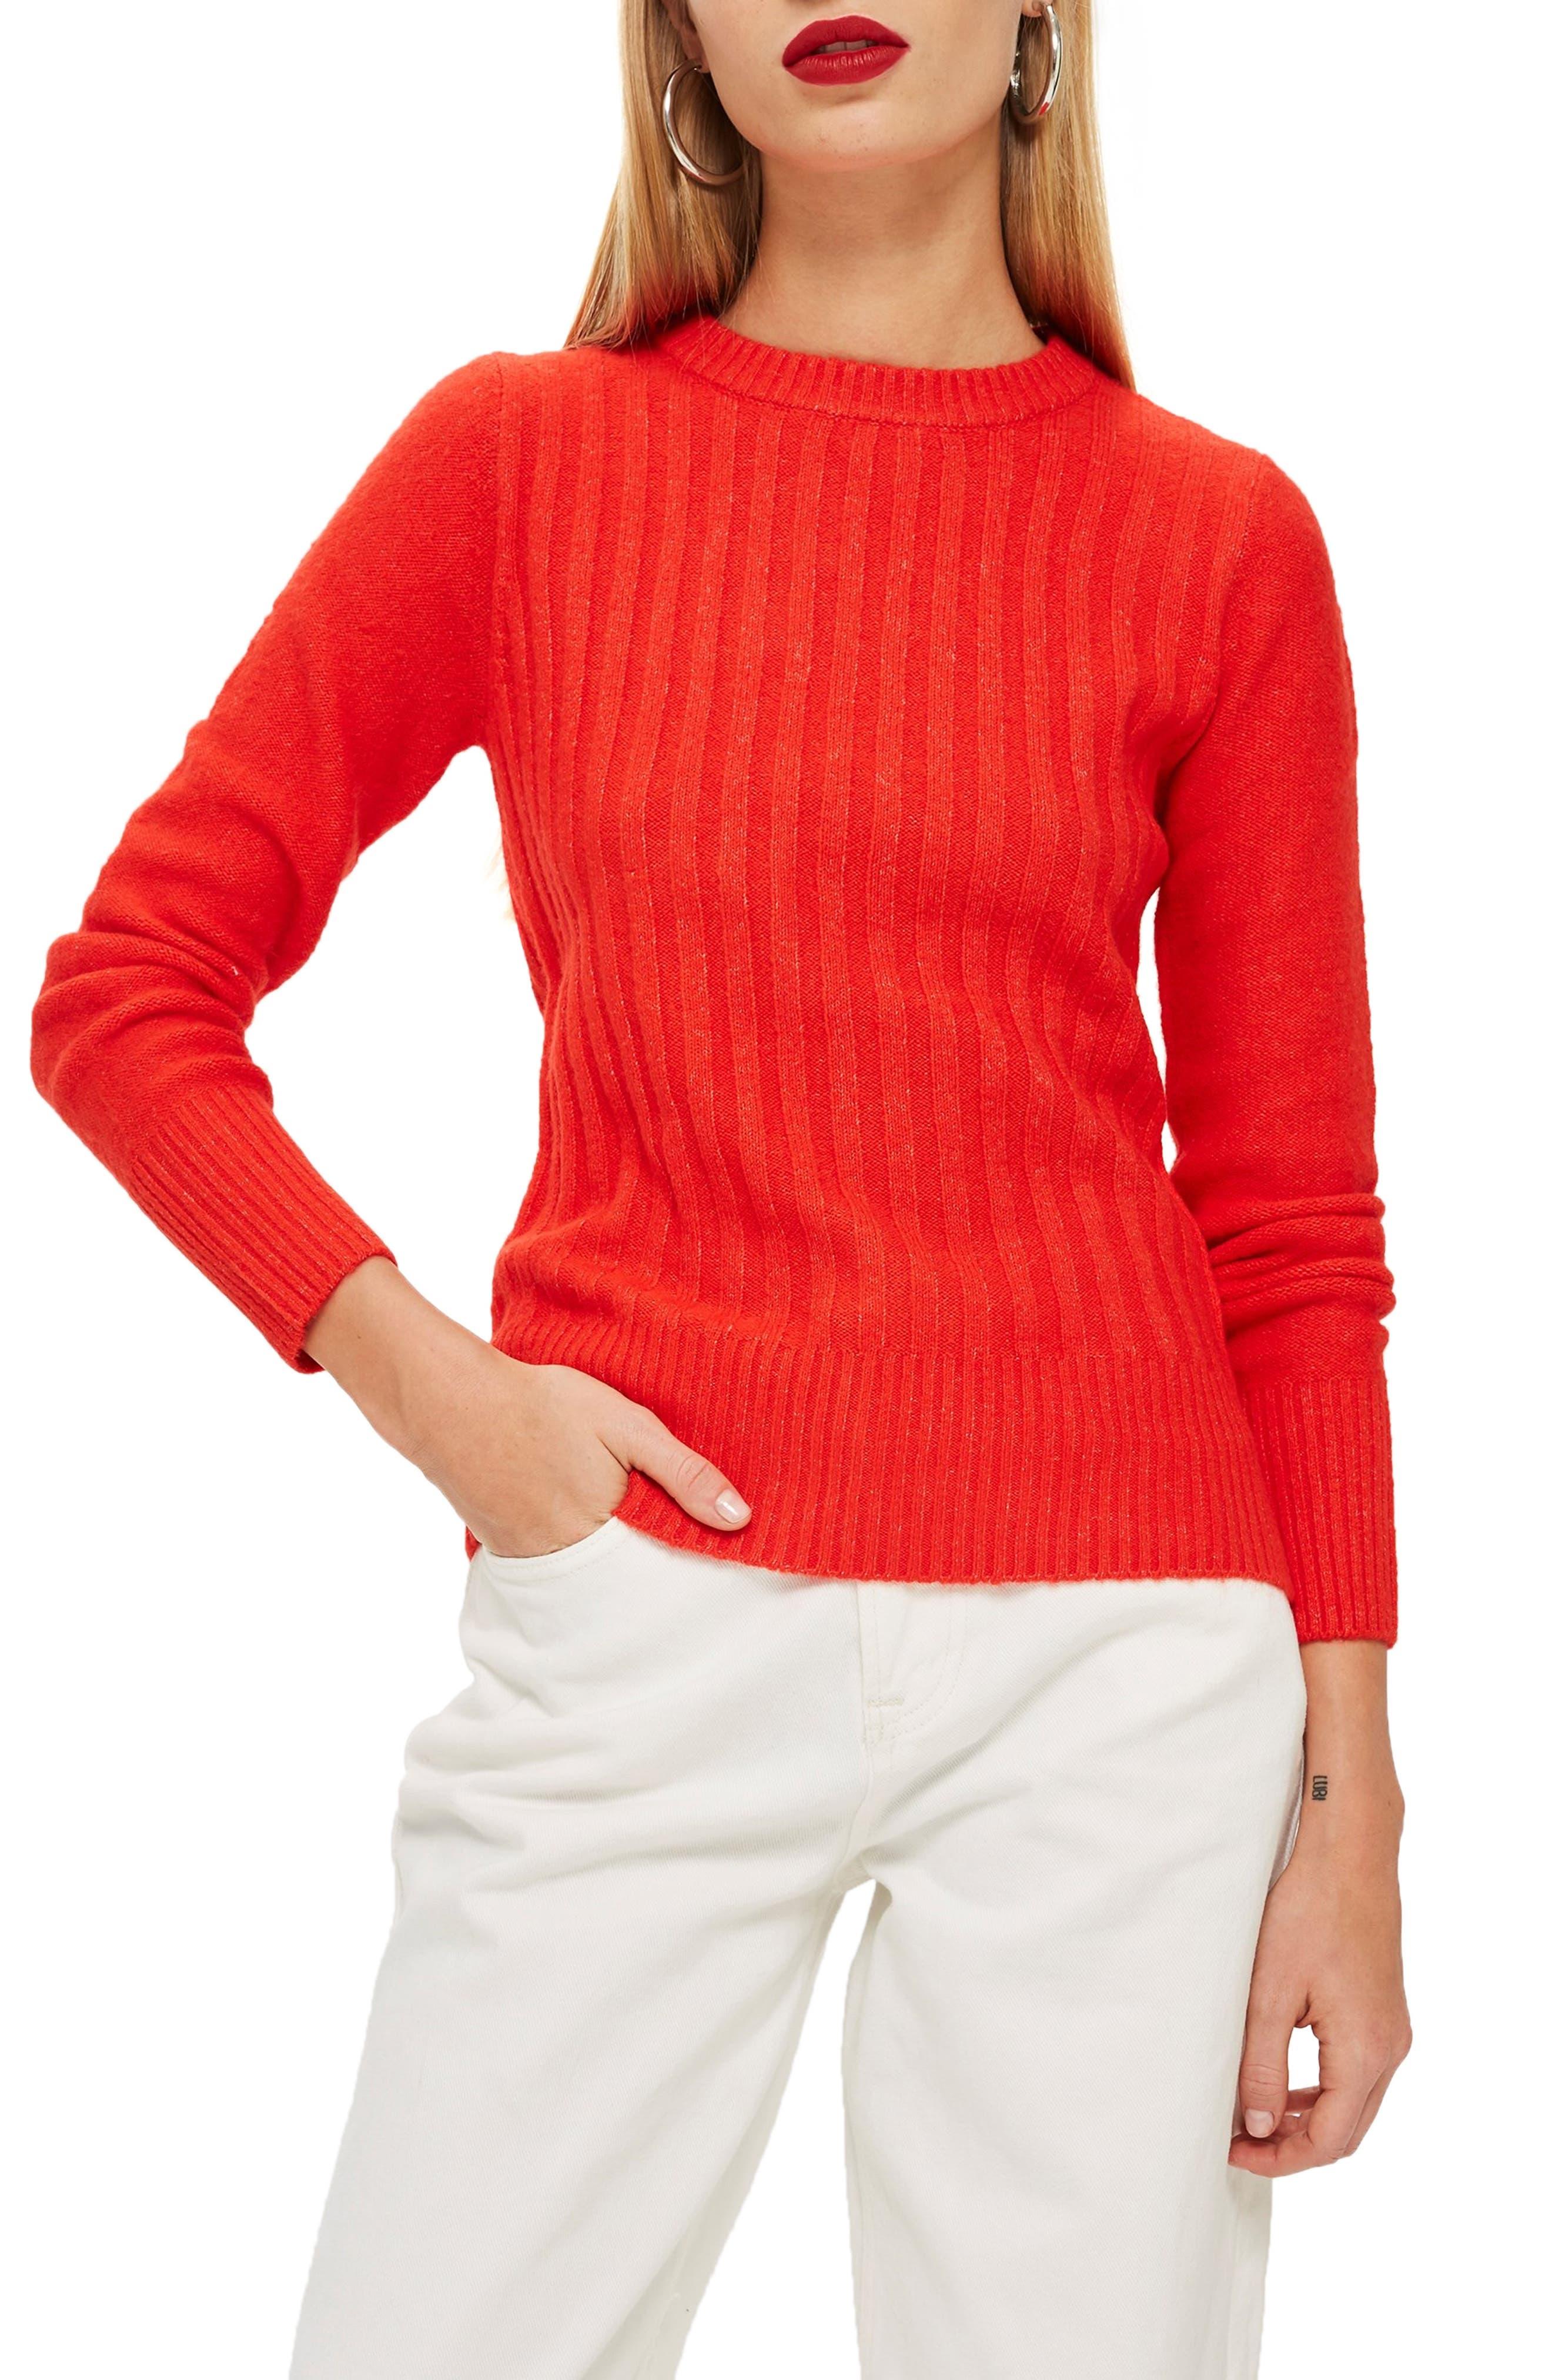 2a35ec9129b7 Topshop Women s Sweaters